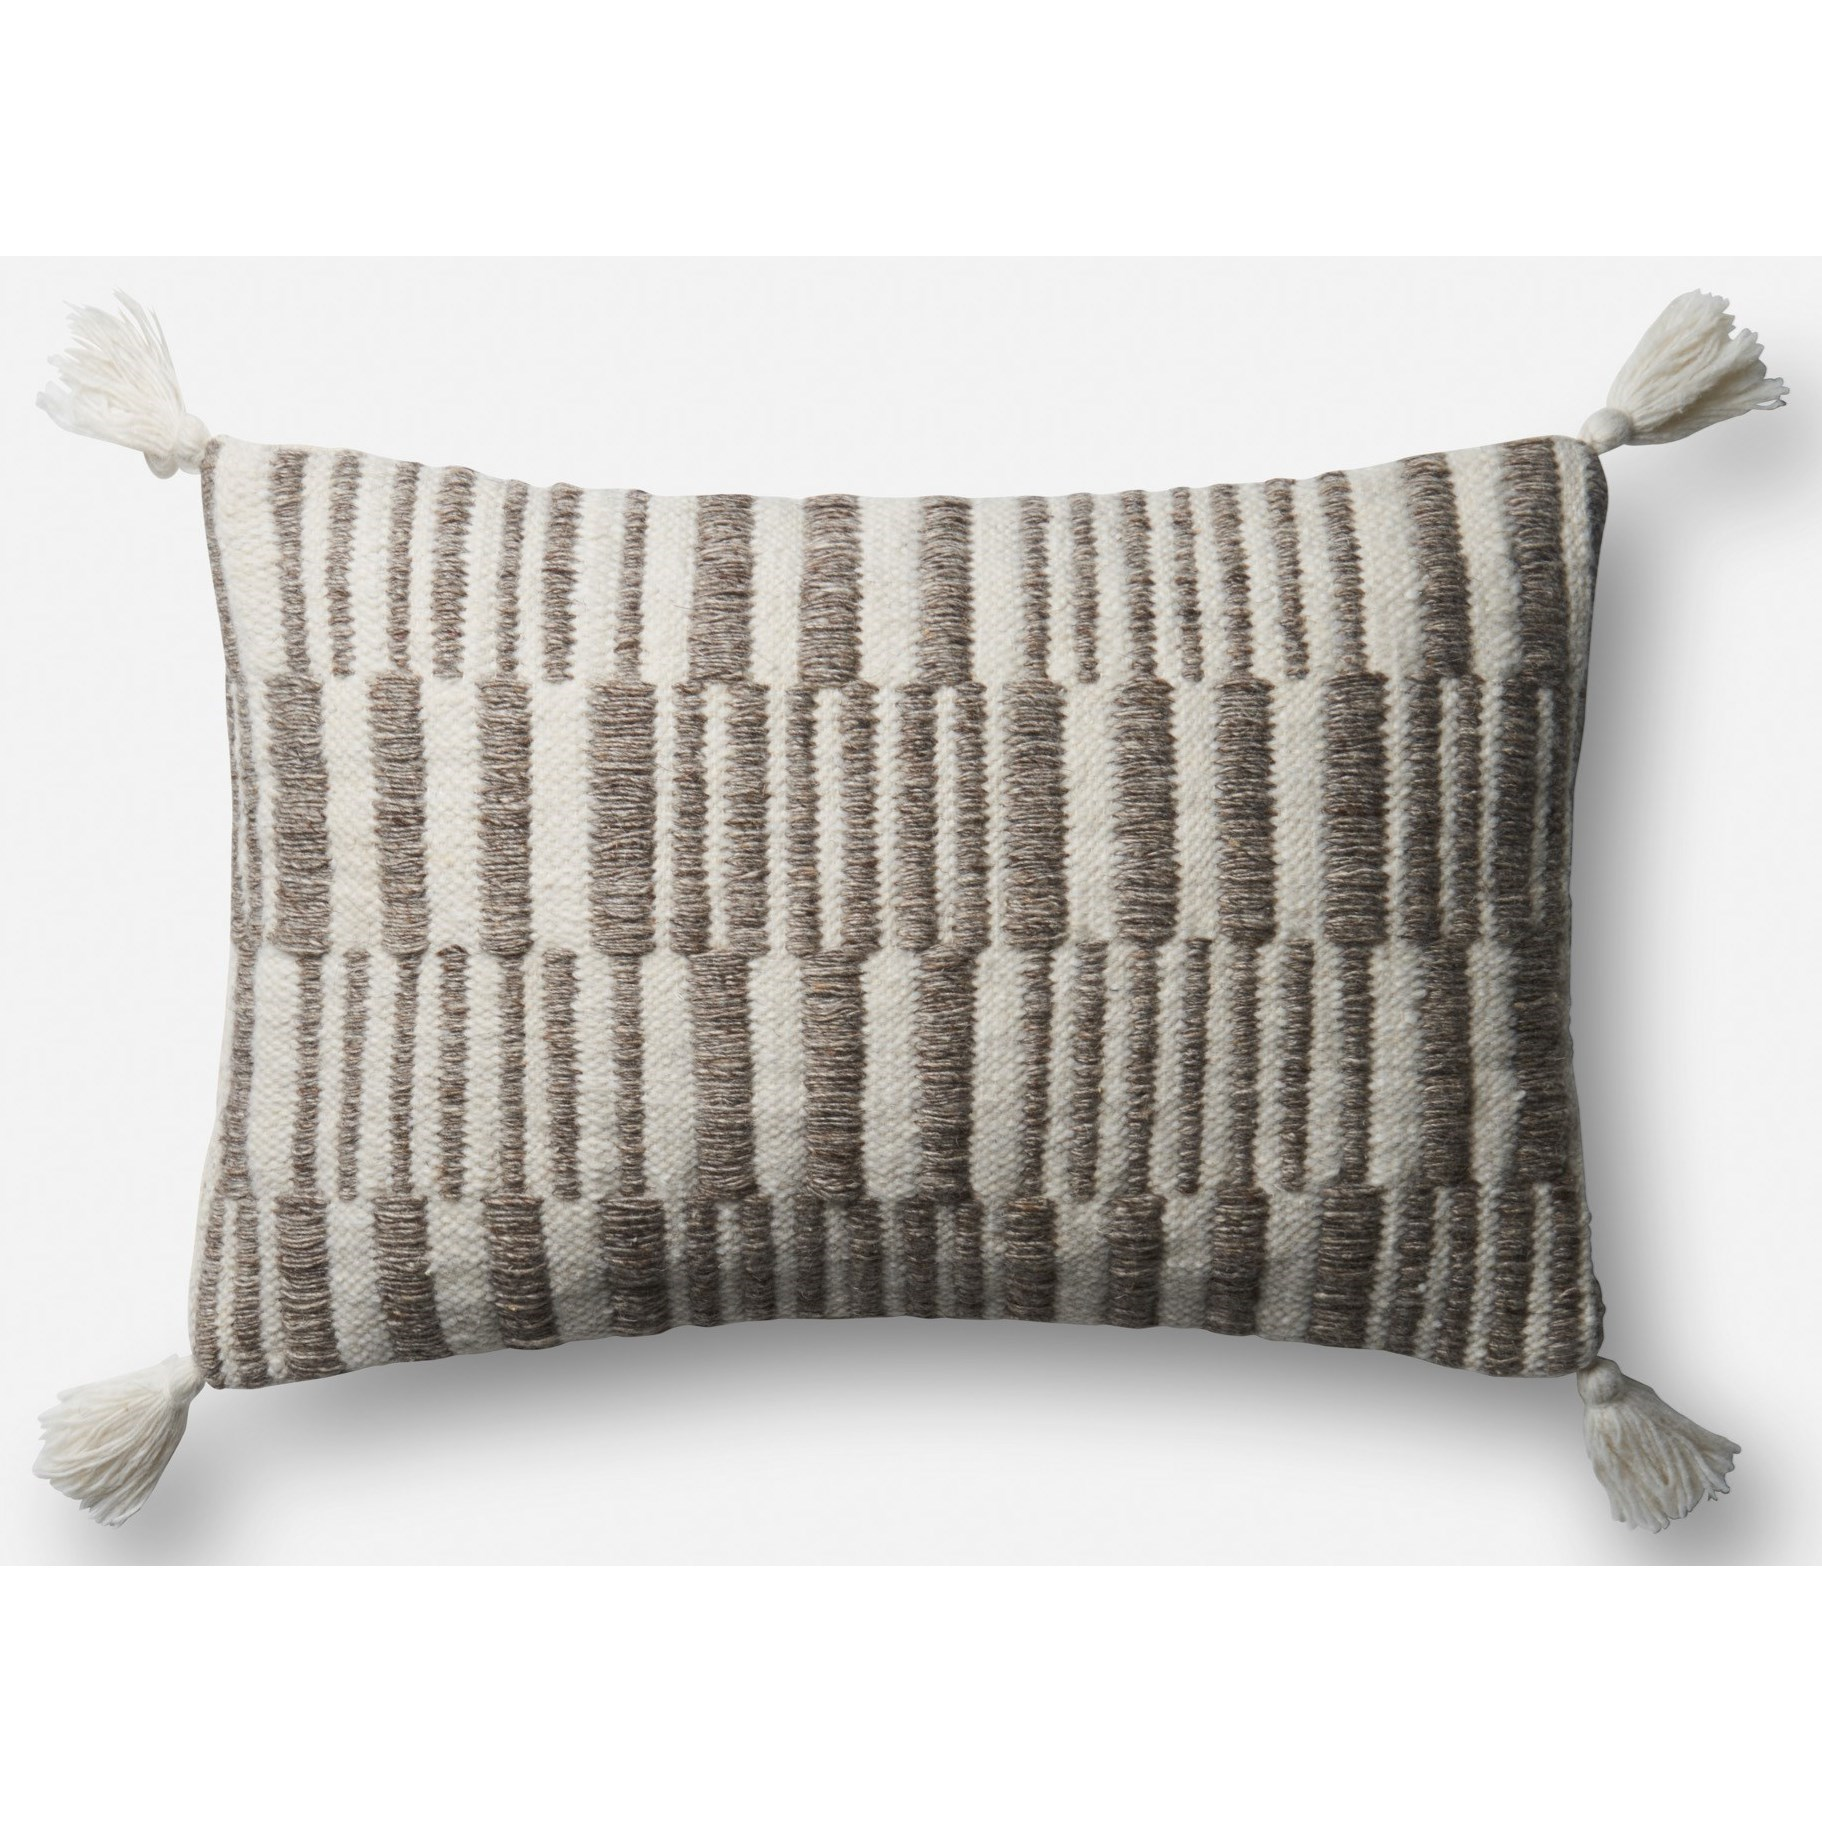 Loloi Rugs Indoor Outdoor Pillows 13 X 21 Brown Natural Pillow W Poly Fill Pedigo Furniture Throw Pillows